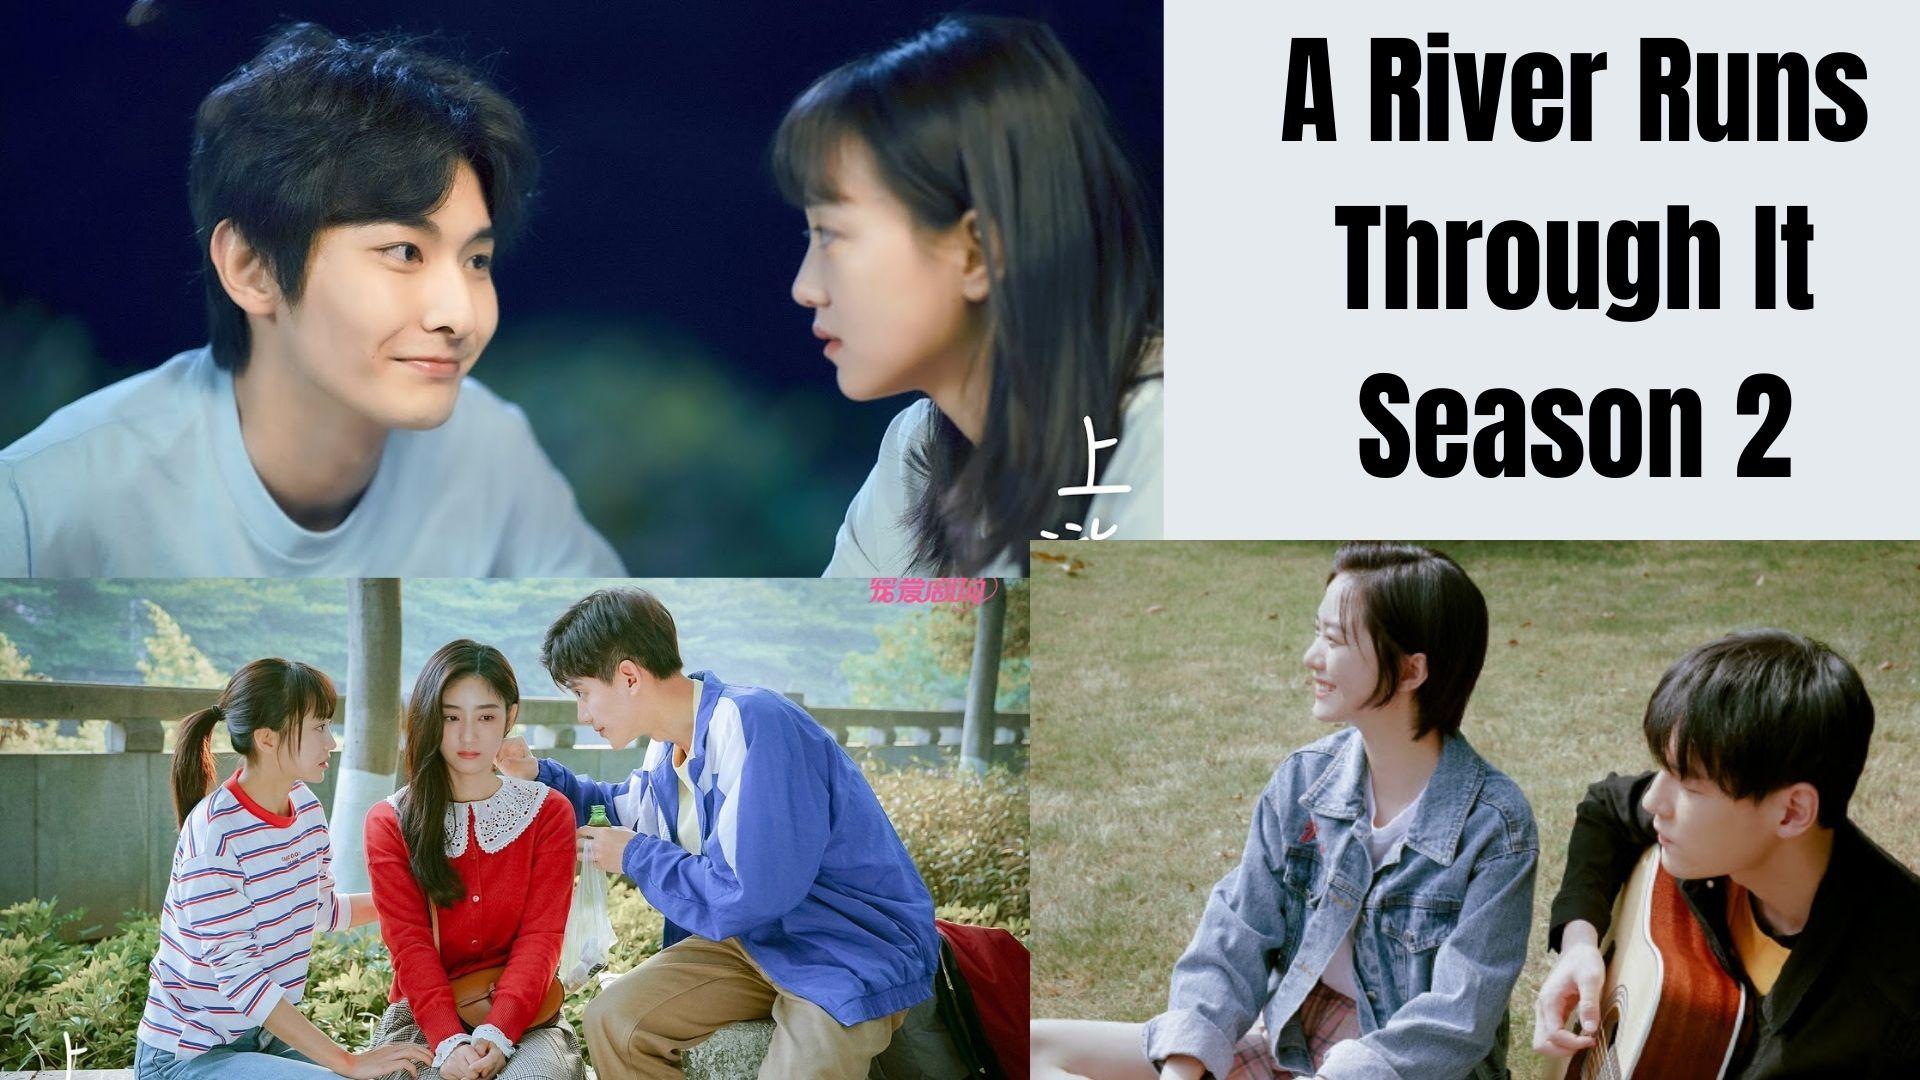 A River Runs Through It Season 2: Is It Happening?